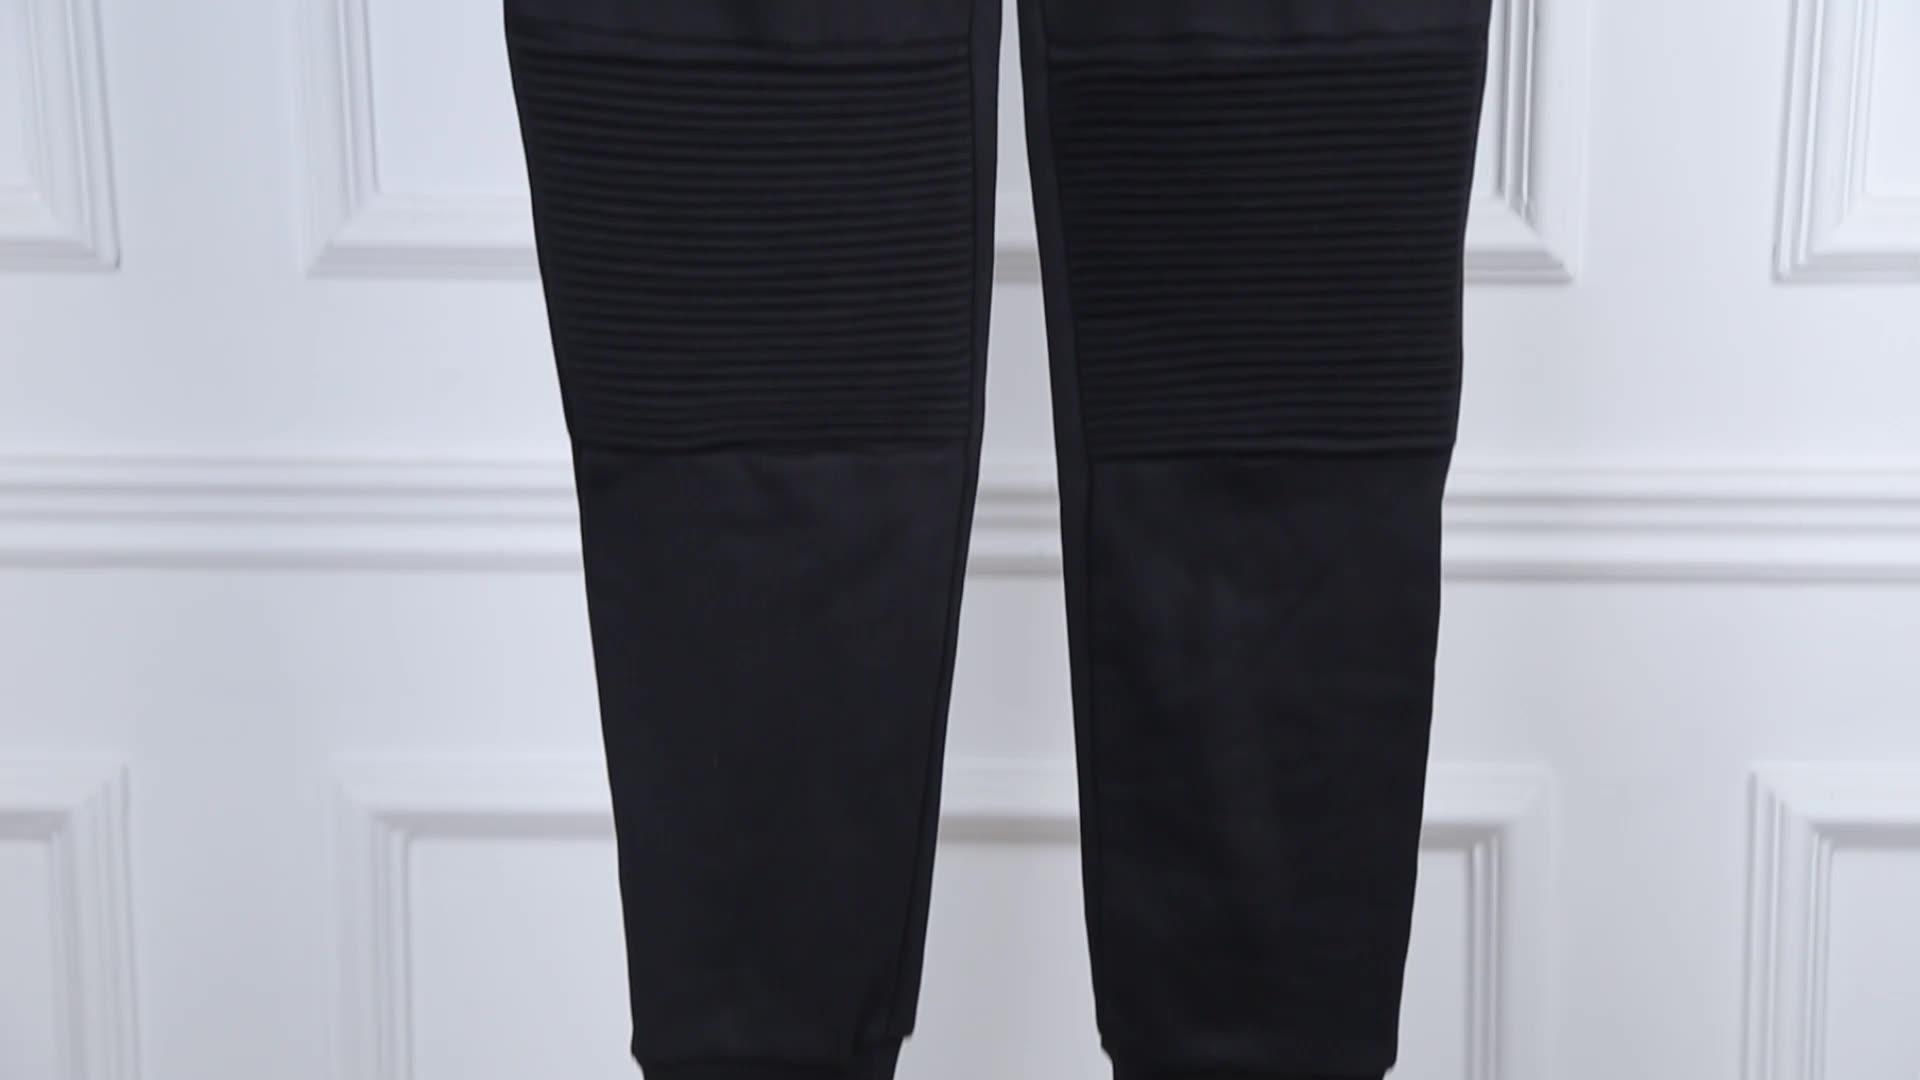 2020 Custom Pria Lari & Cepat Kering Hiking Celana untuk Pria & Kustom Celana Olahraga